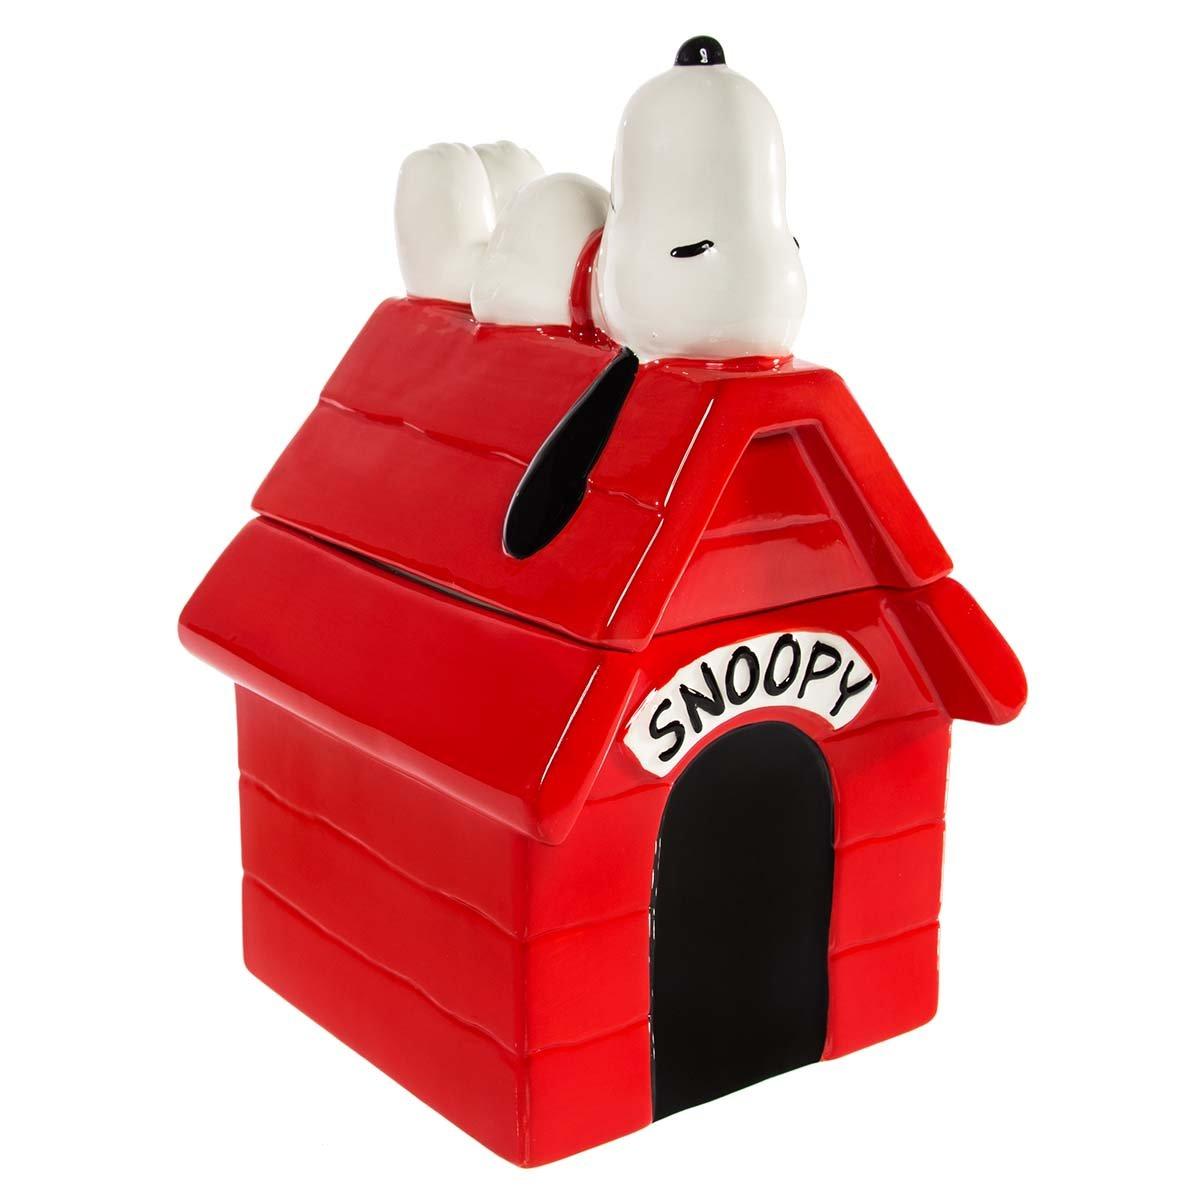 Peanuts Snoopy Dog House Ceramic Cookie  Jar